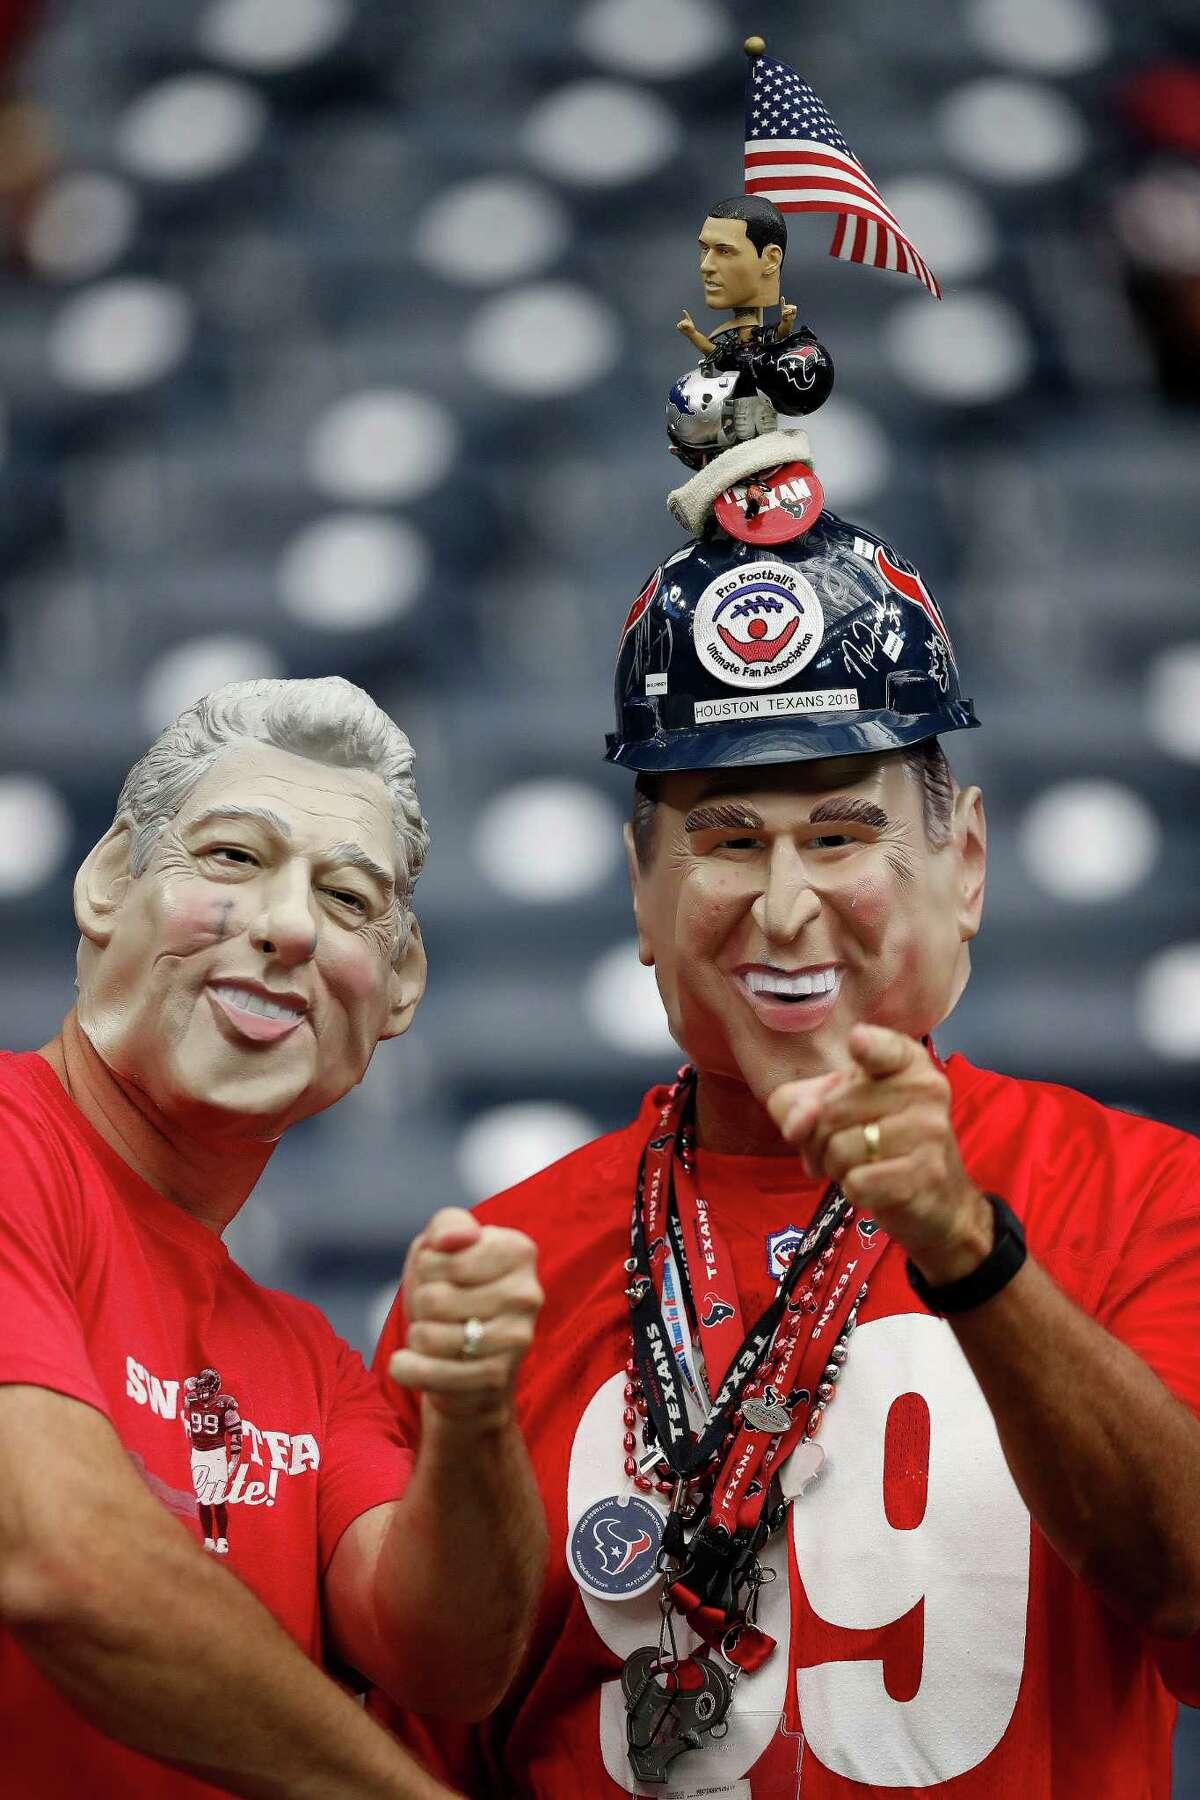 Houston Texans fan Mark Baughman wearing a George Bush mask hams it up with